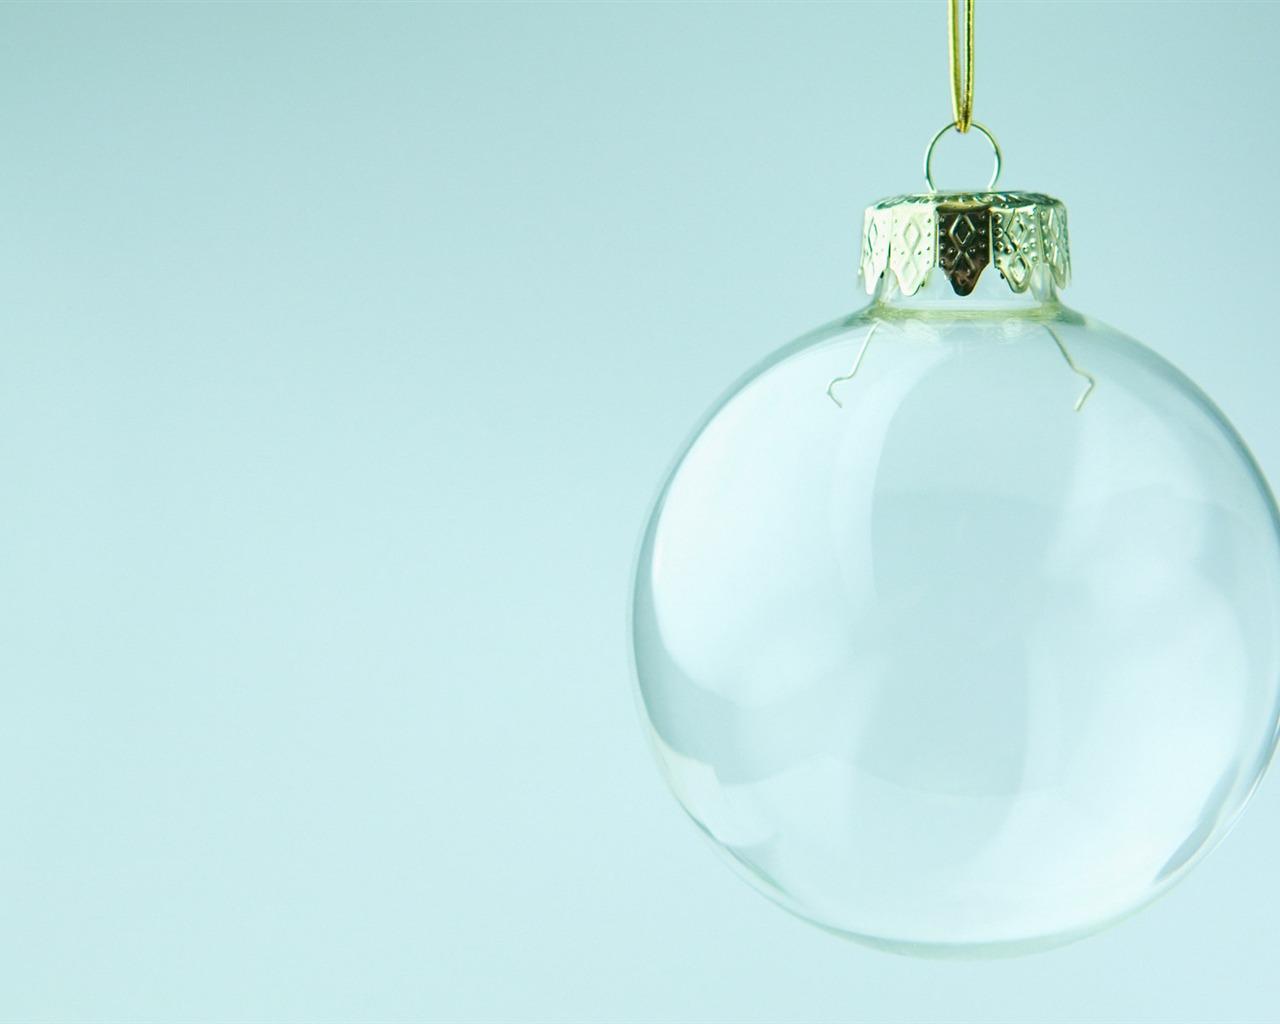 transparent glass christmas ball wallpaper preview. Black Bedroom Furniture Sets. Home Design Ideas